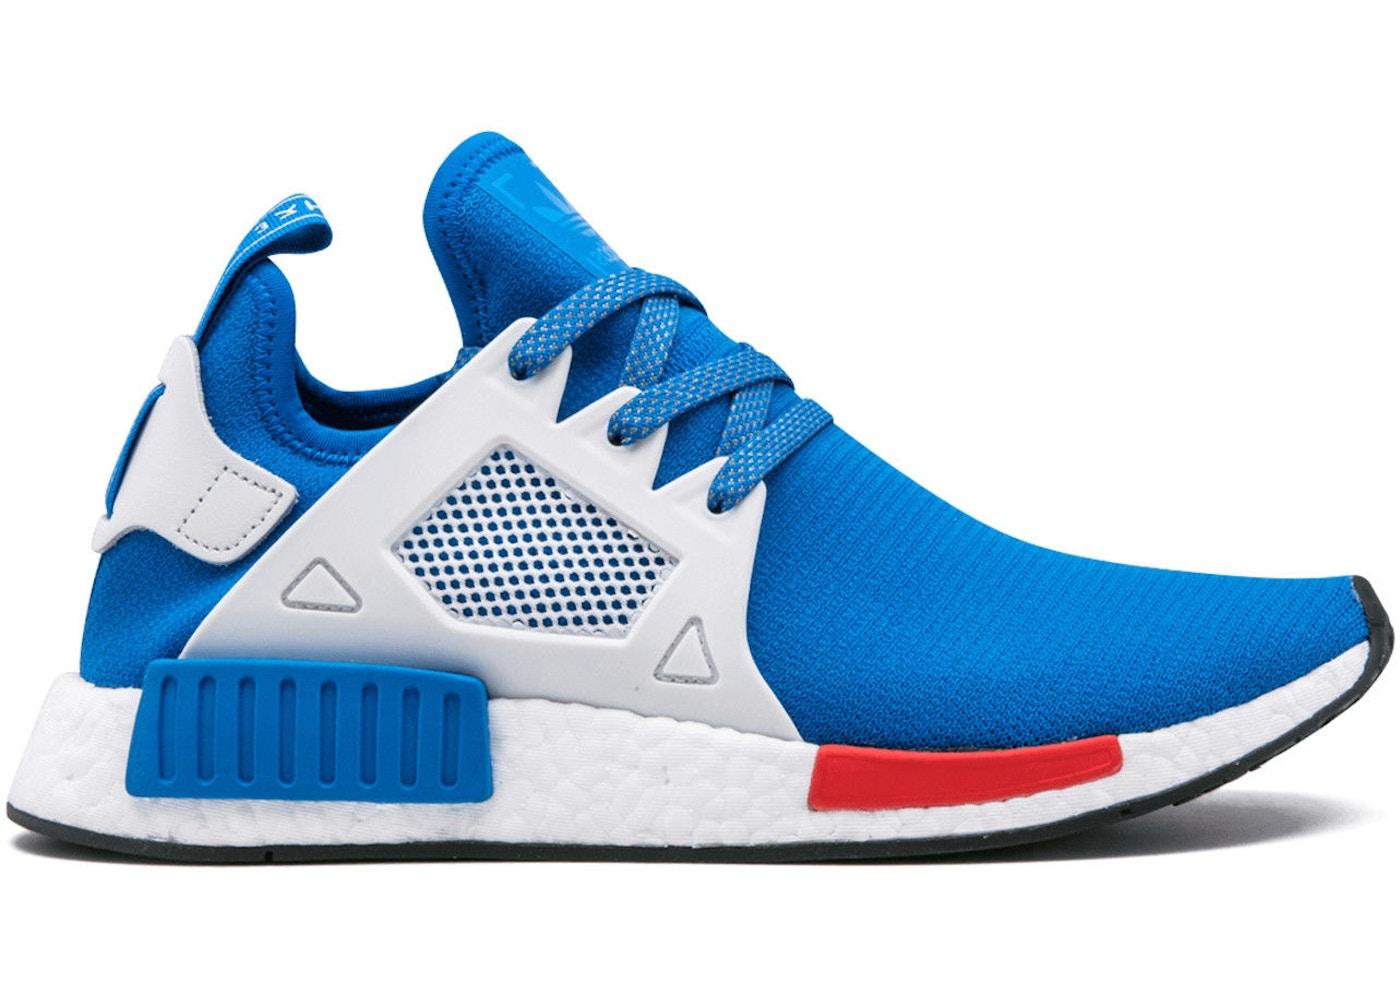 Adidas nmd xr1 bluebird